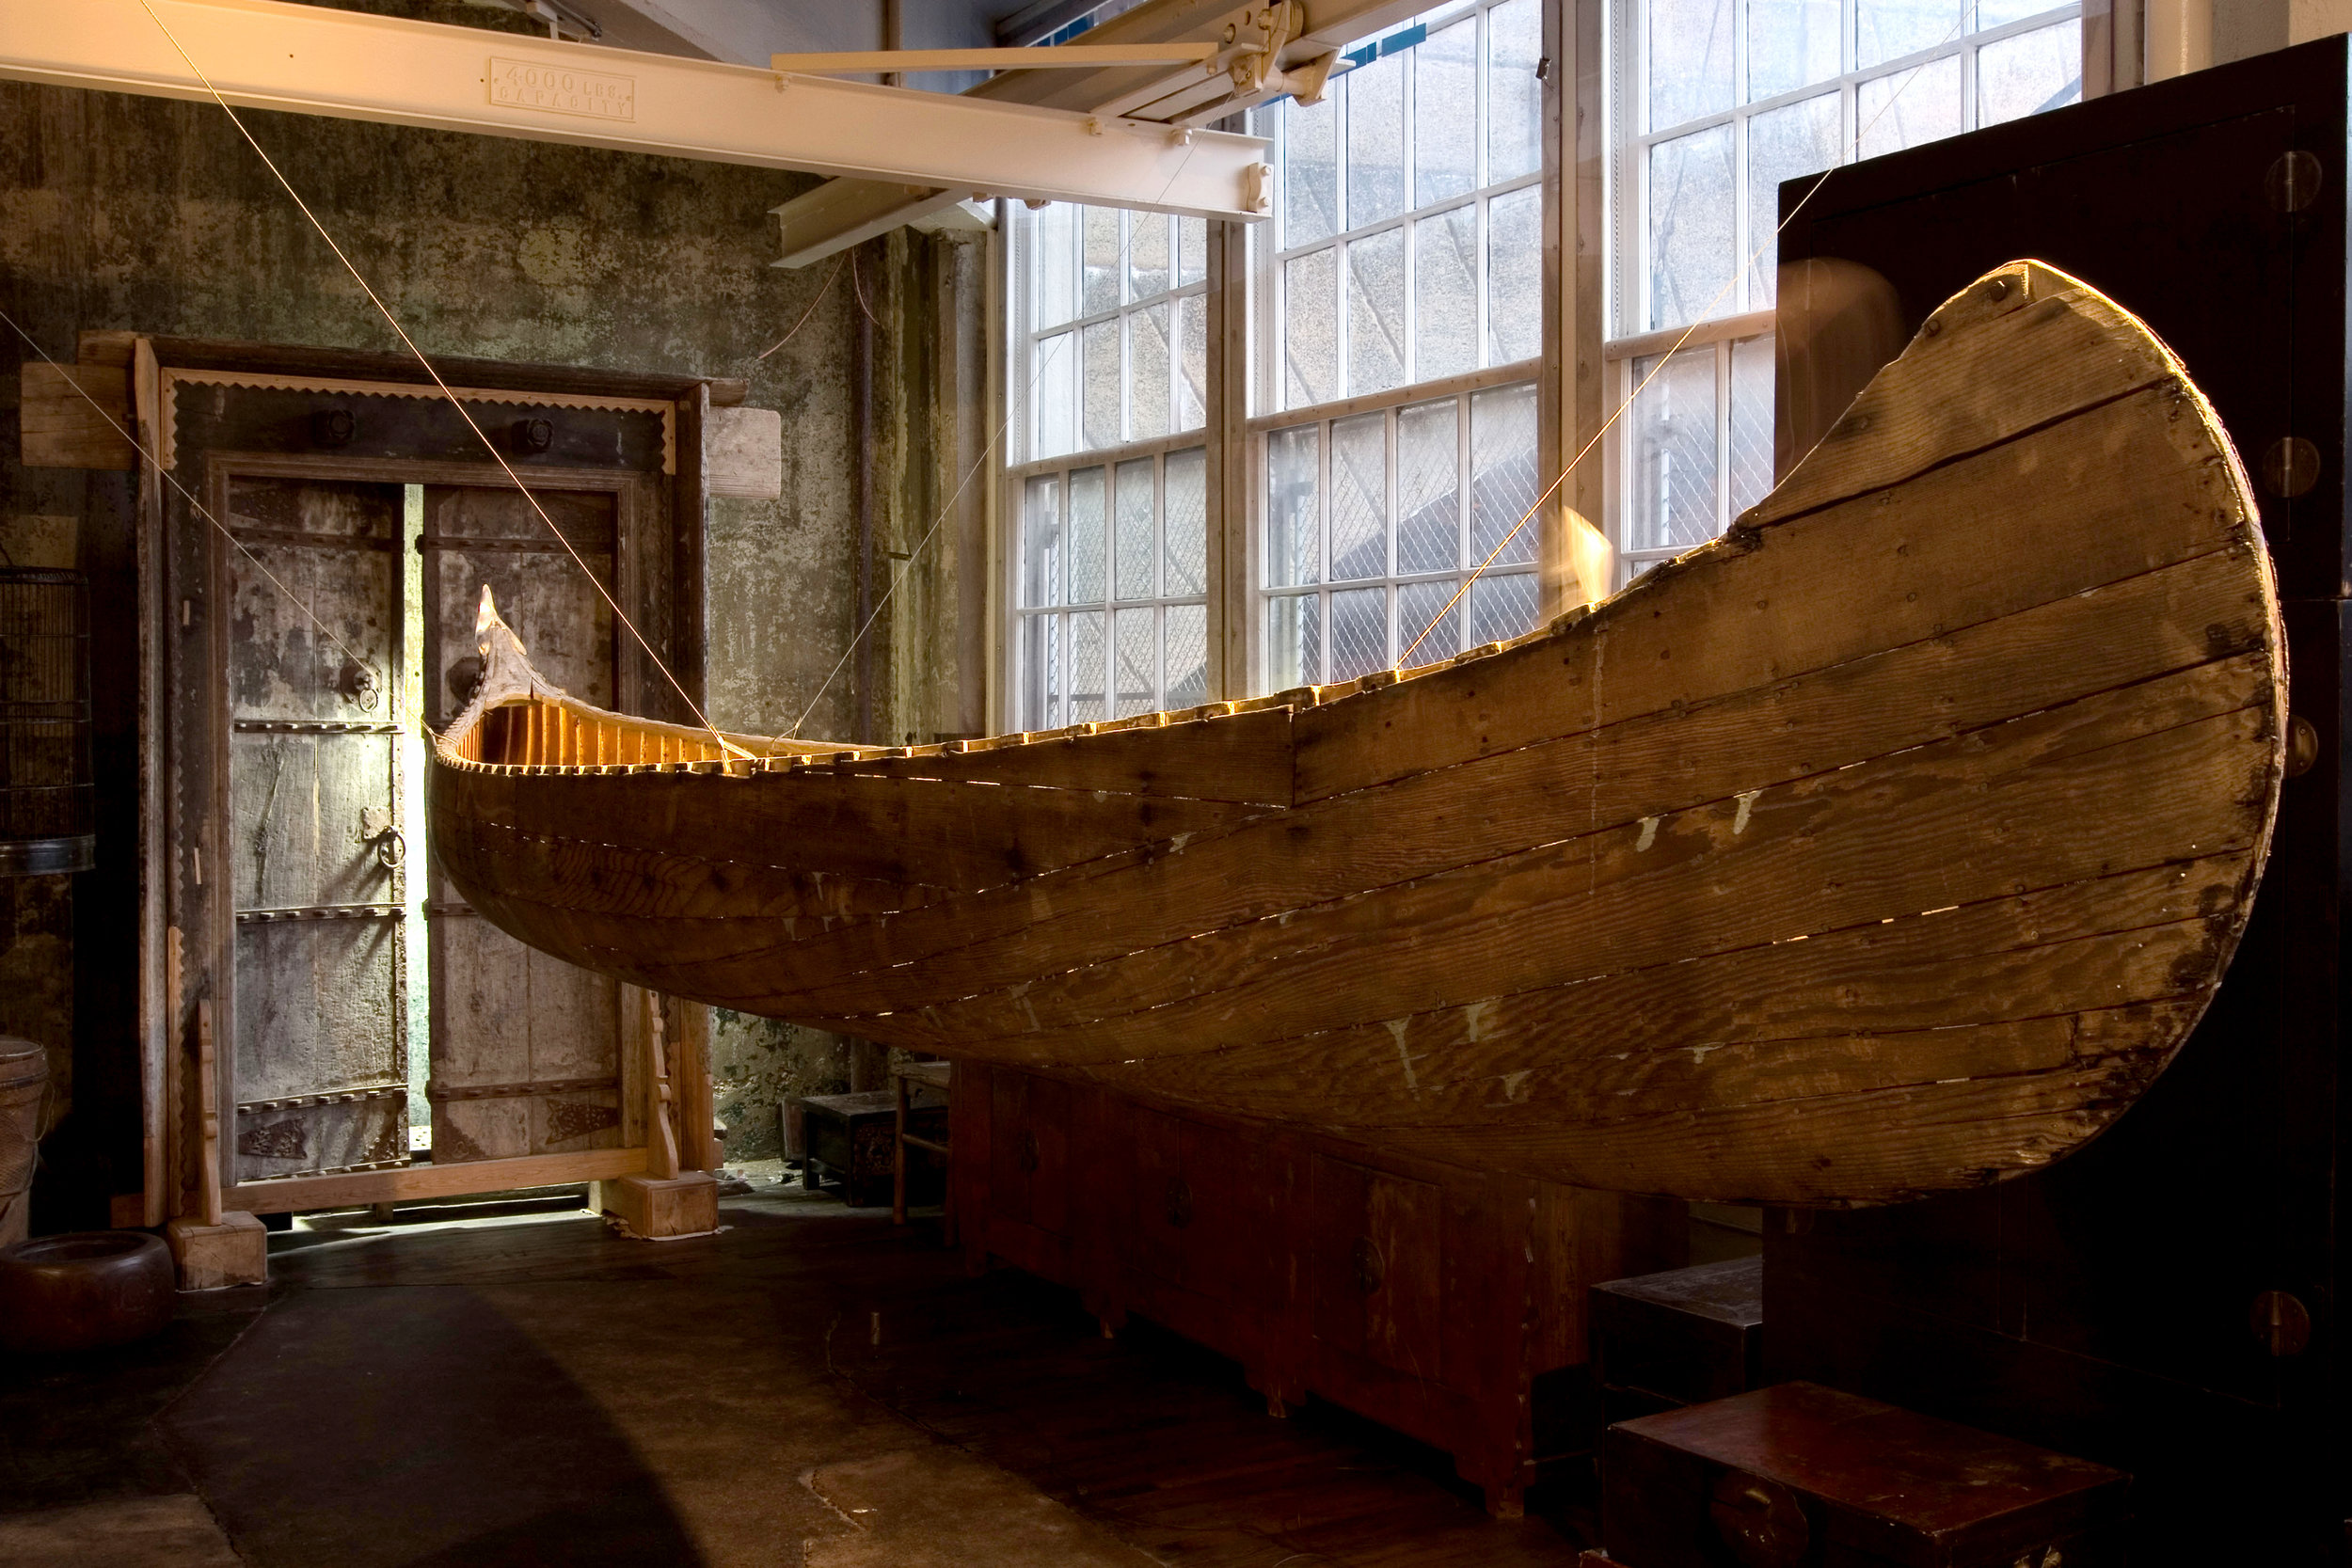 155 boat1byVincentFeldman.jpg